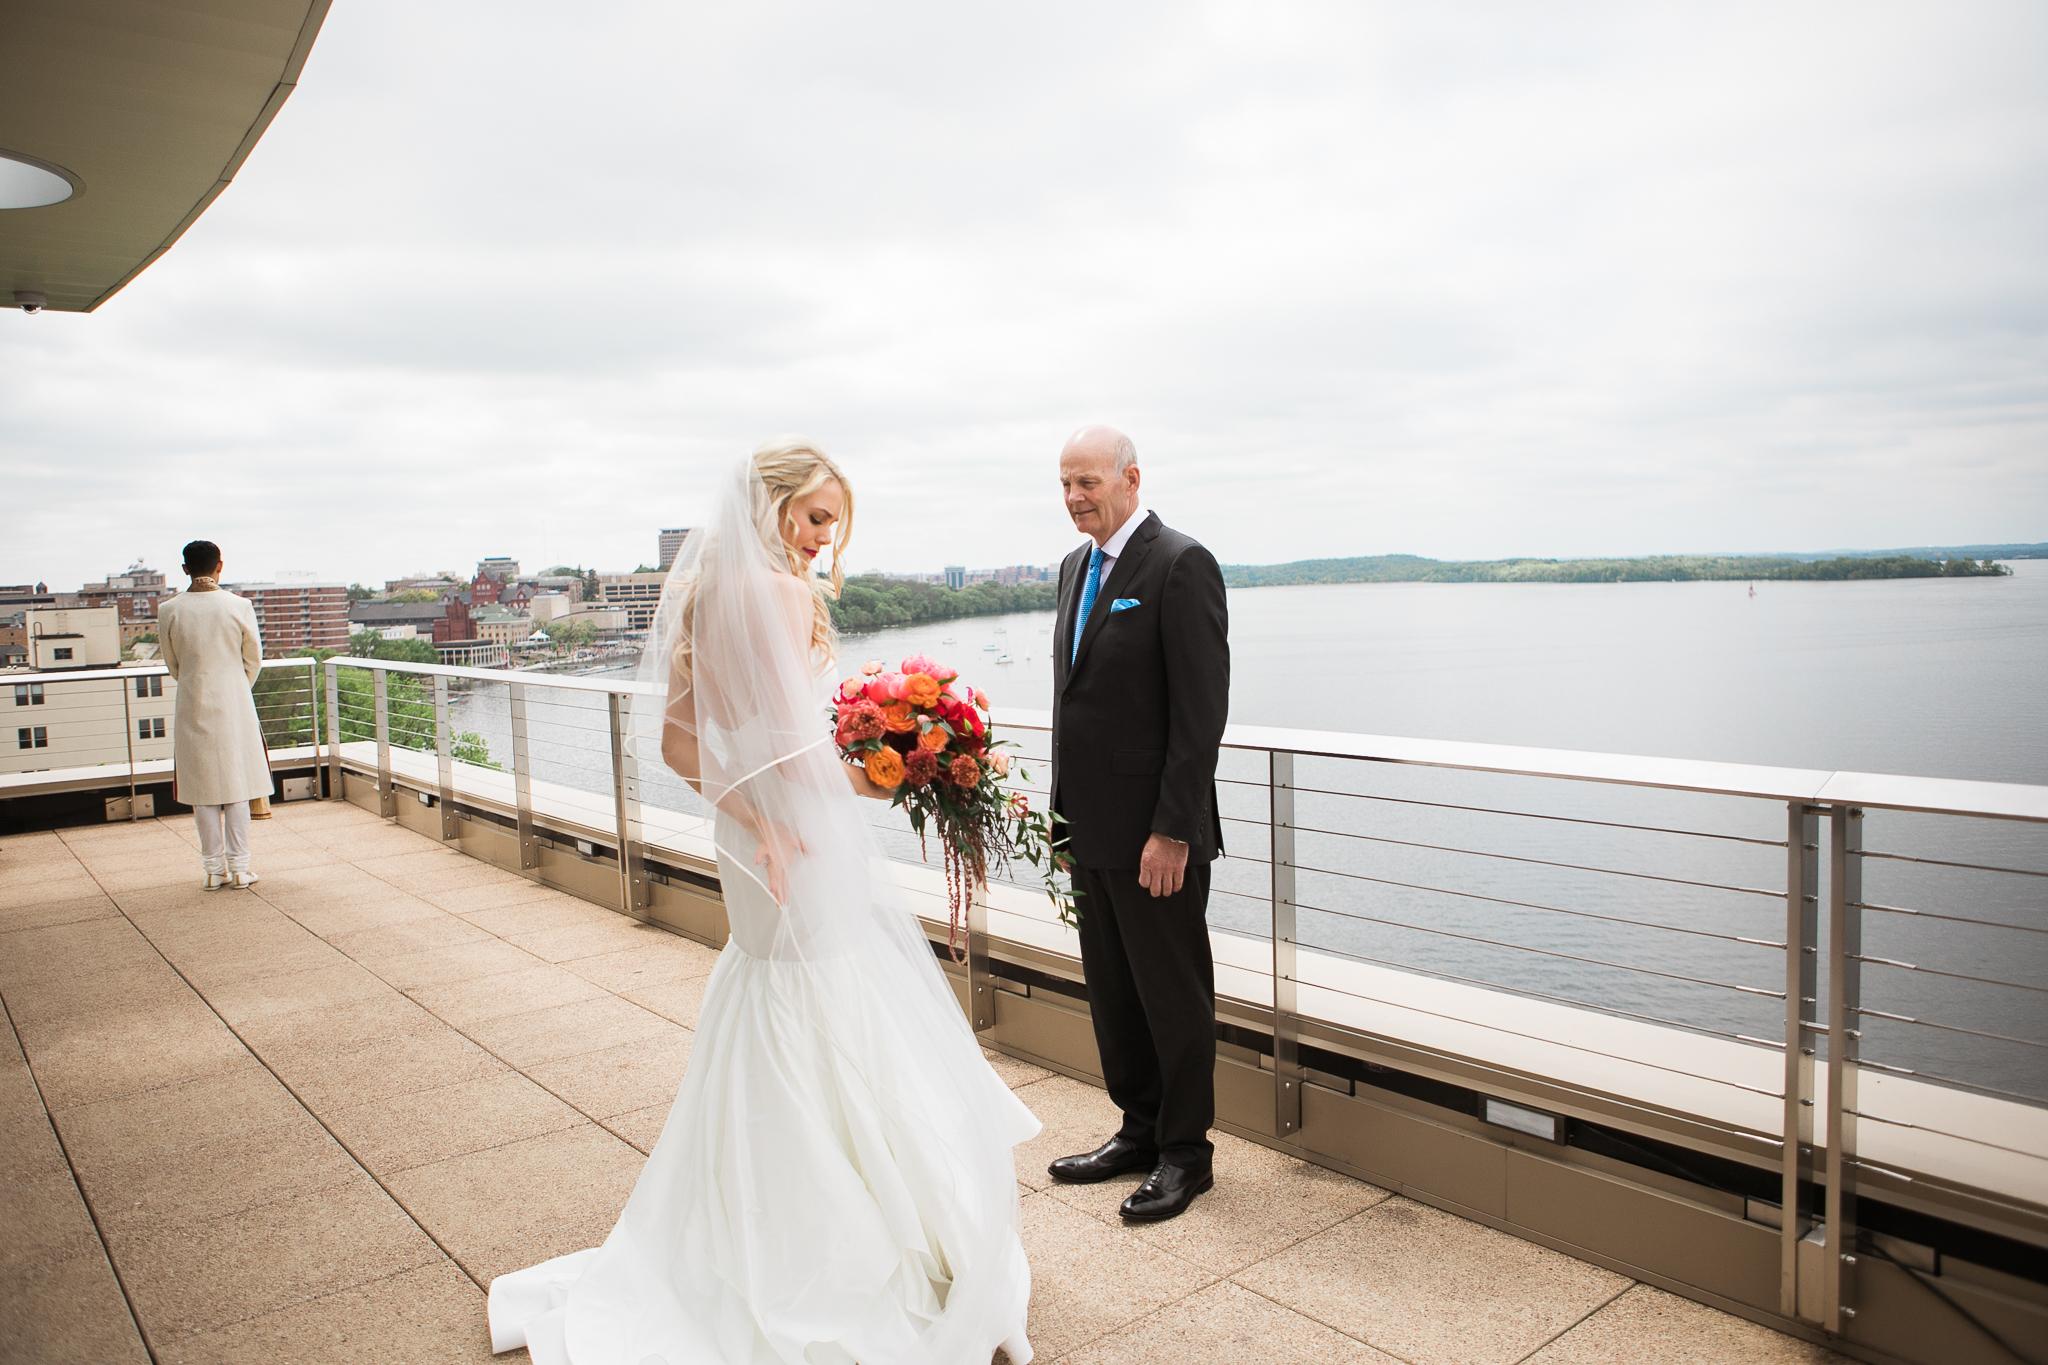 Indian-Fusion-wedding-Madison-Wisconsin_029.jpg